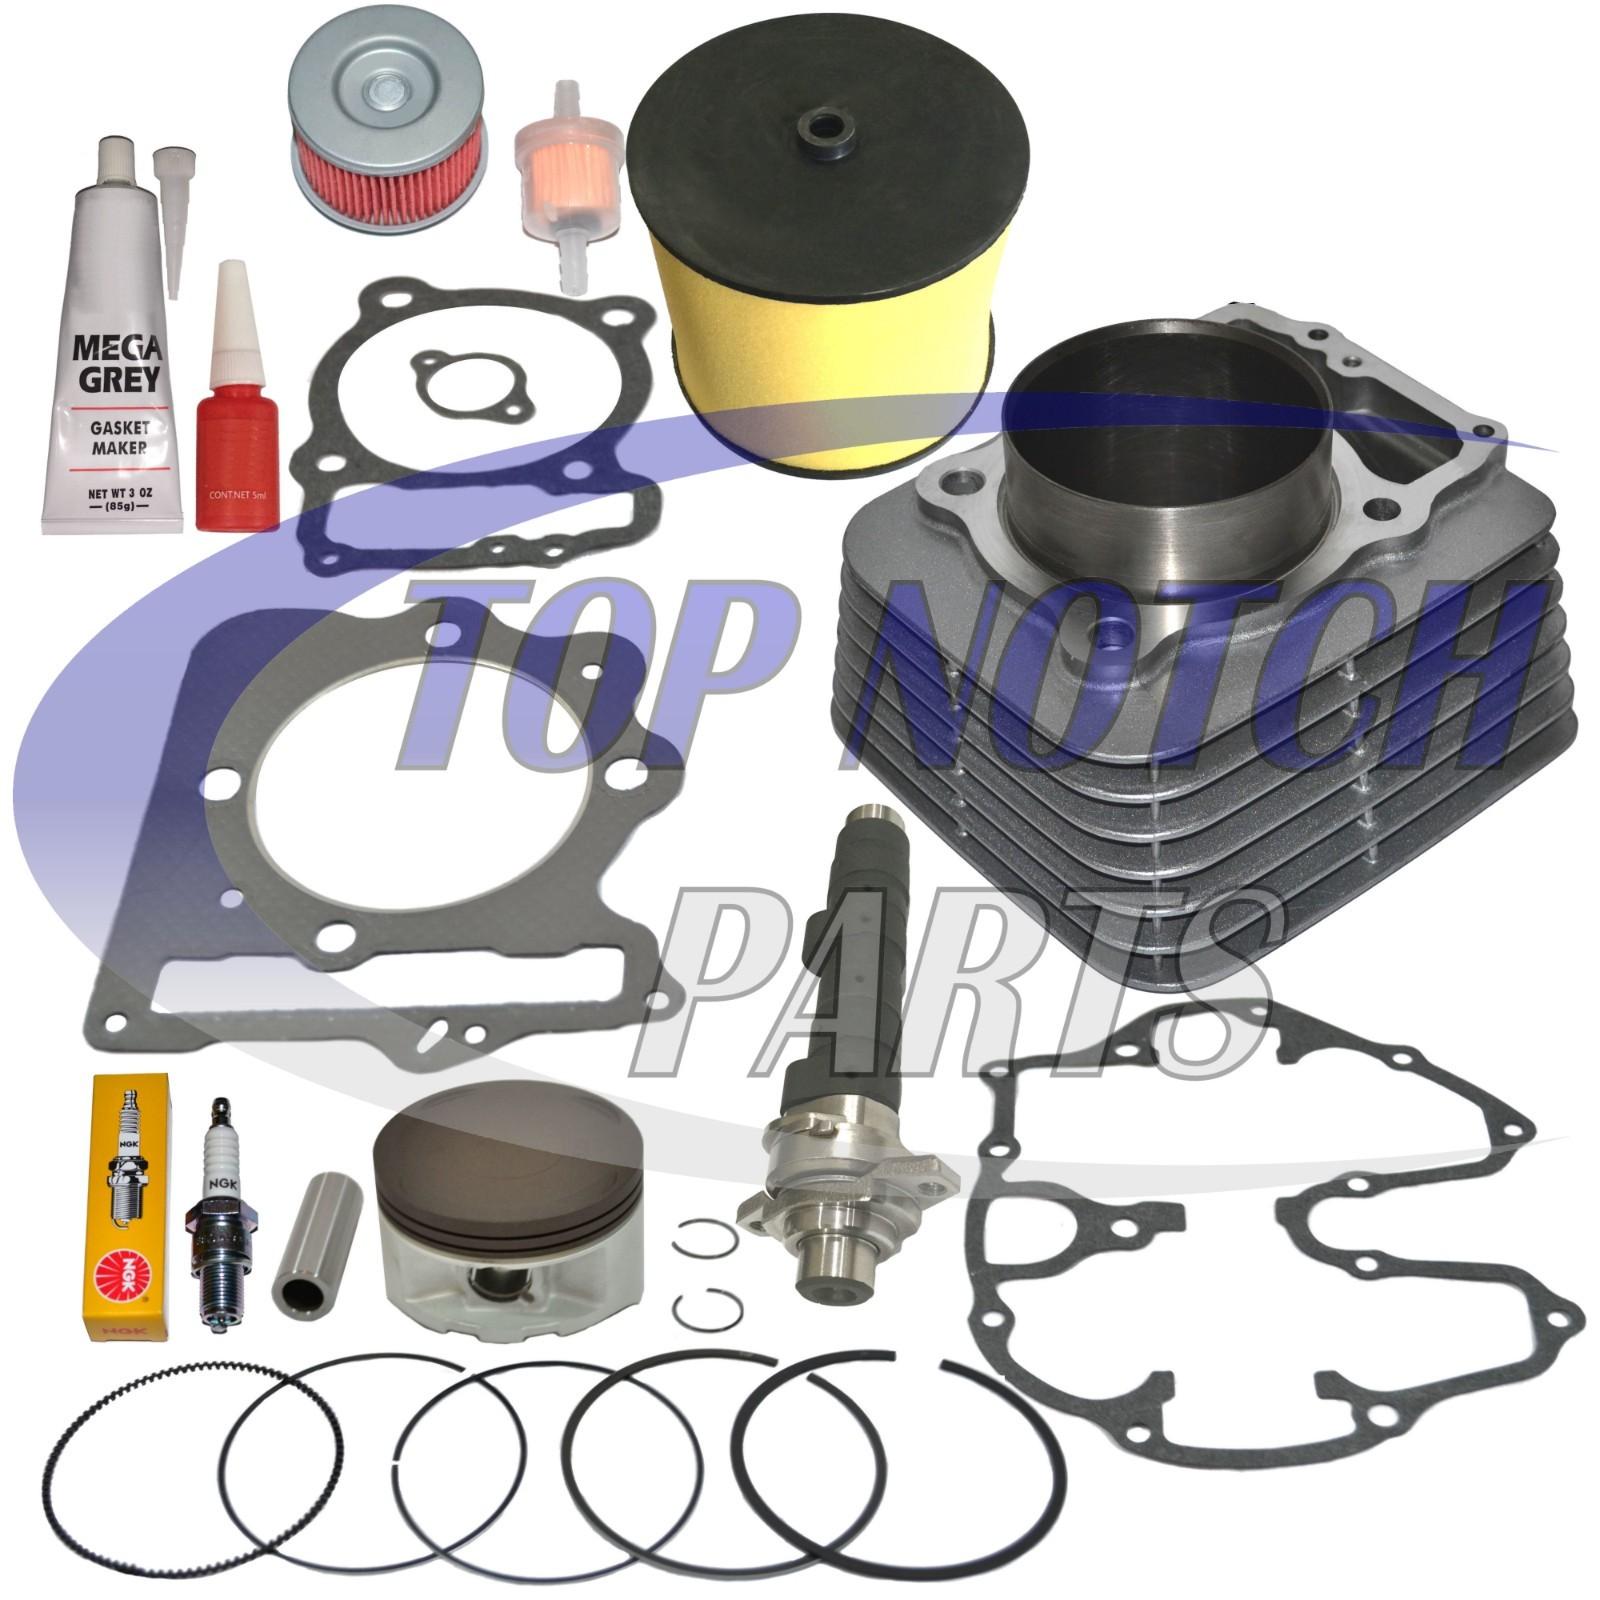 Motorcycle Engine Parts For Honda Xr400 Xr 400 1996 2004: Honda Xr 400r XR400R Xr 400 Cylinder Piston Cover Cam